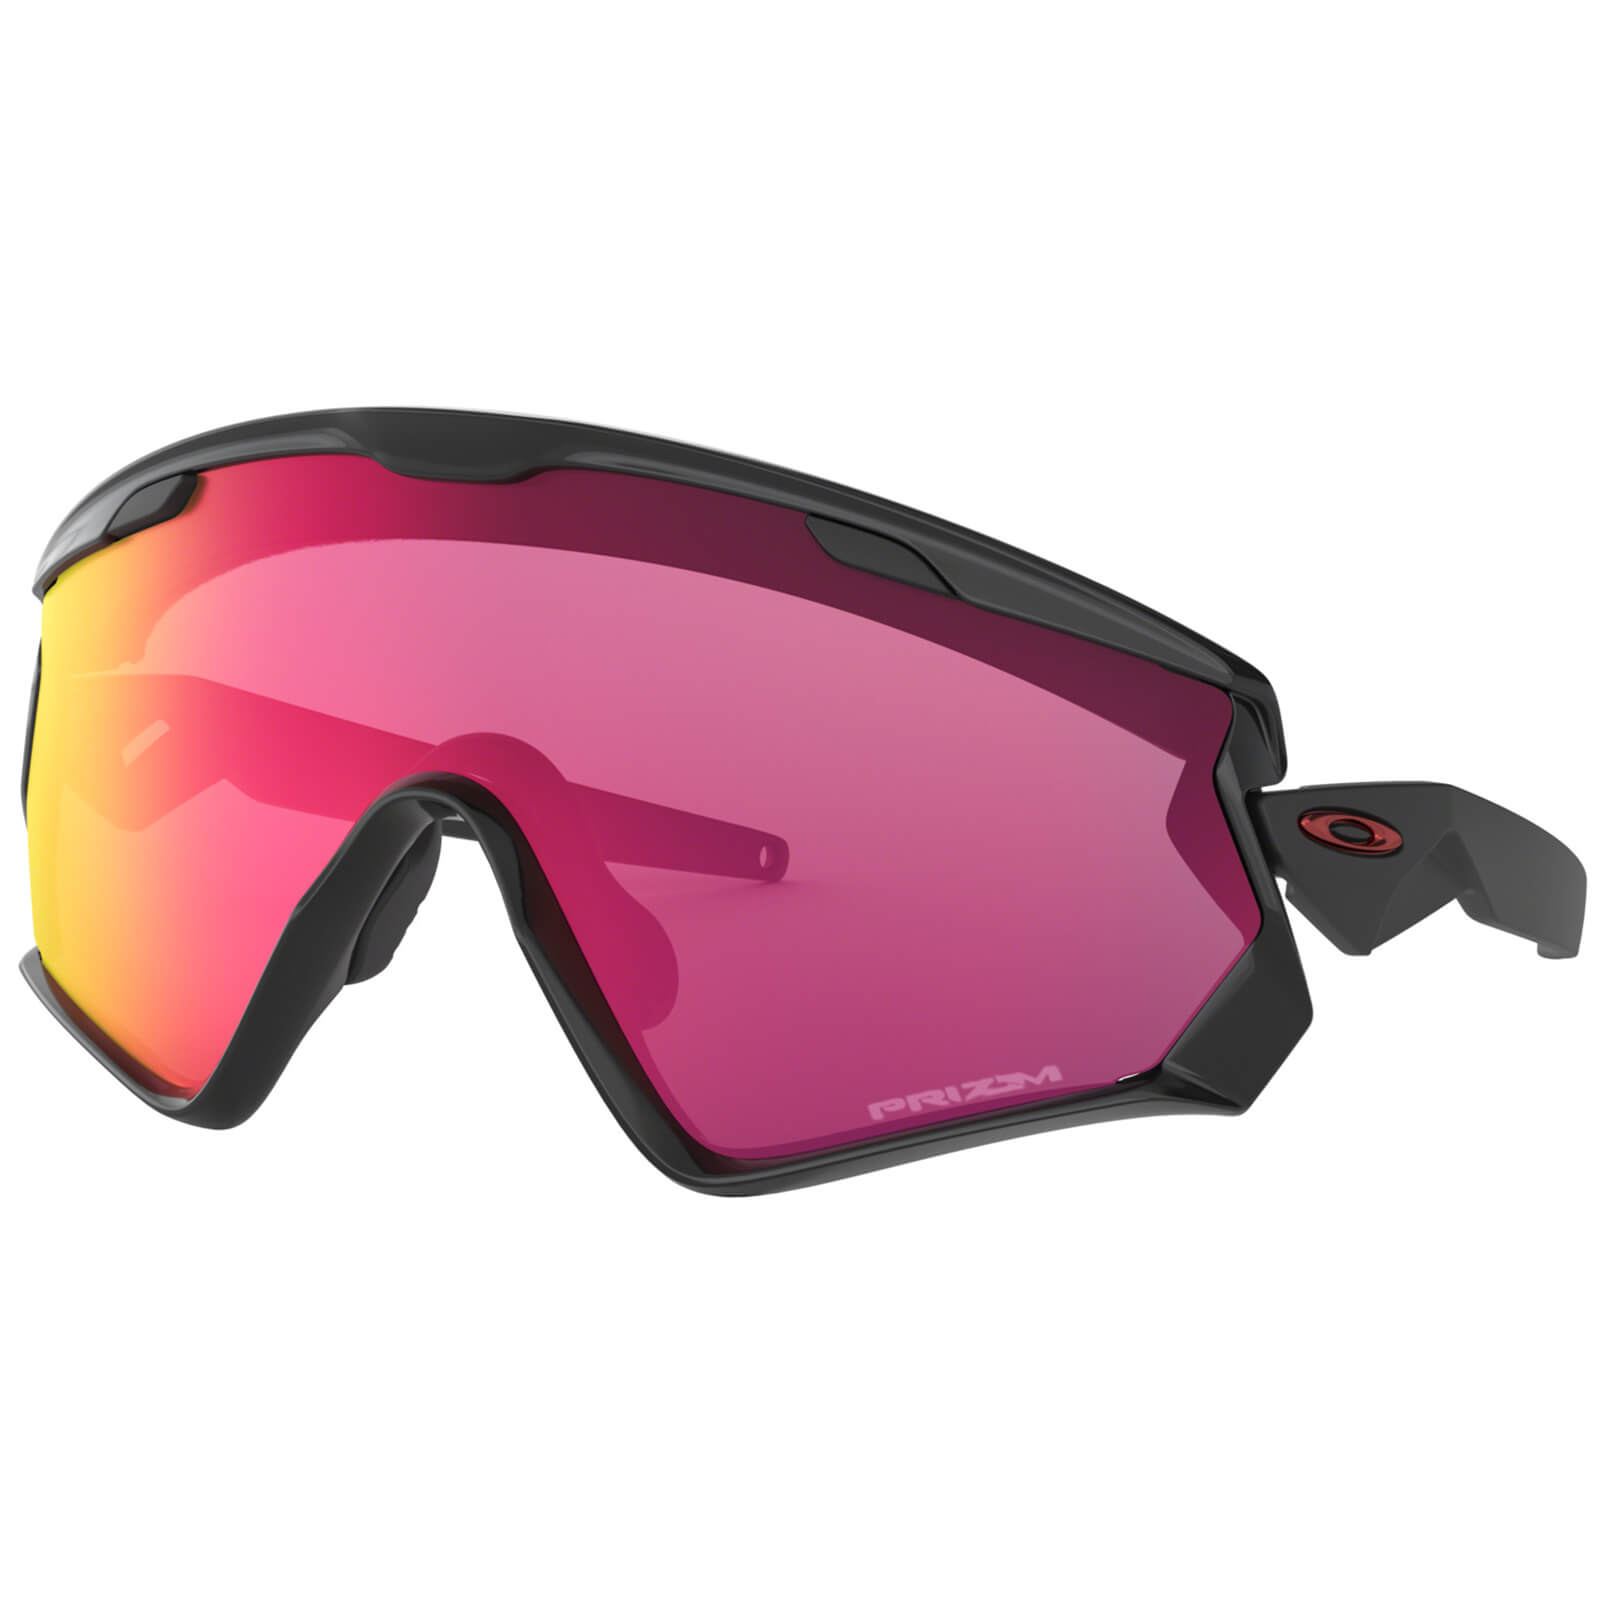 8a93d559aa6 Oakley Wind Jacket 2.0 Sunglasses - Polished Black Prizm Road ...